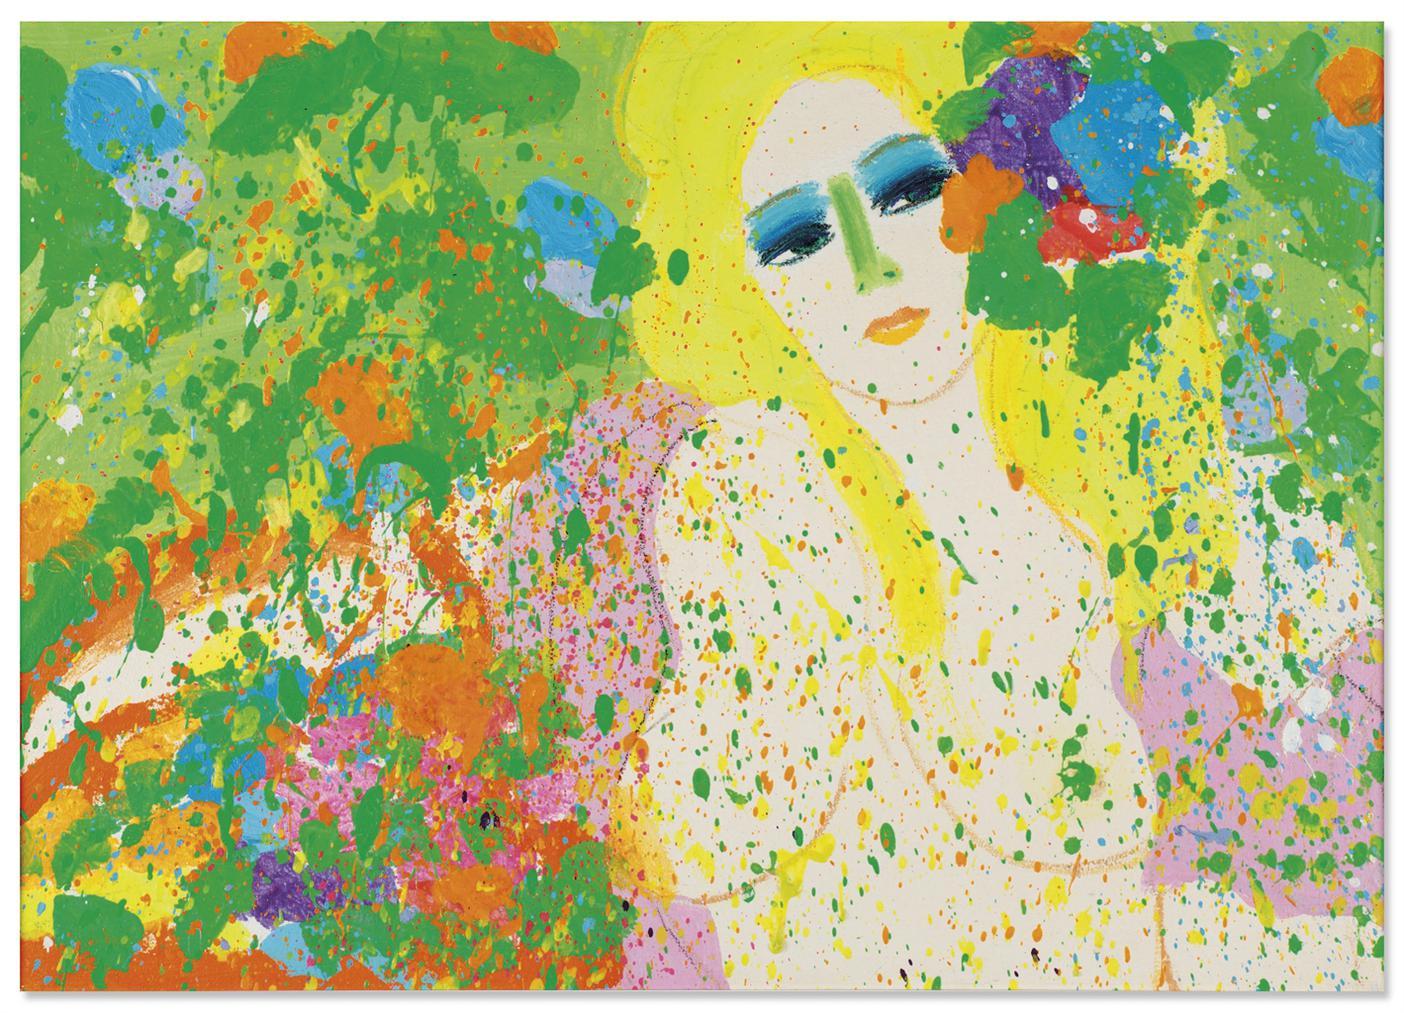 Walasse Ting-I Bring You A Spring-1971